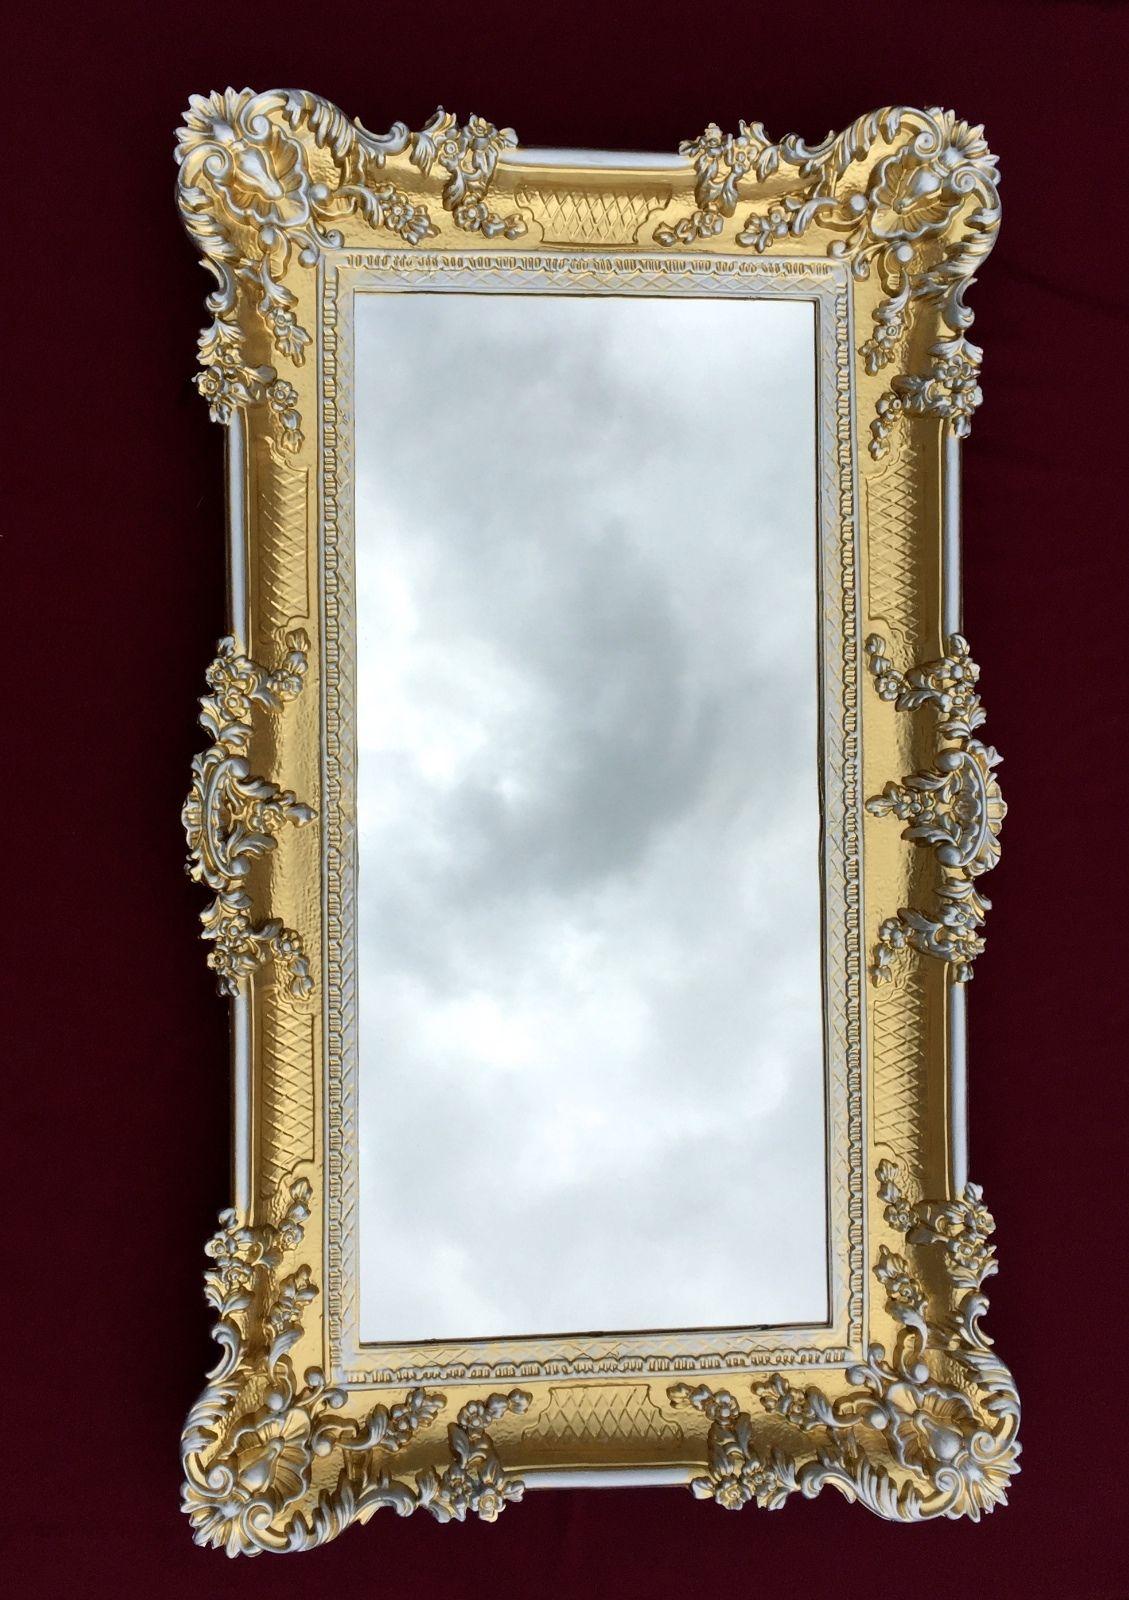 wandspiegel barock gold silber spiegel antik 97x57. Black Bedroom Furniture Sets. Home Design Ideas